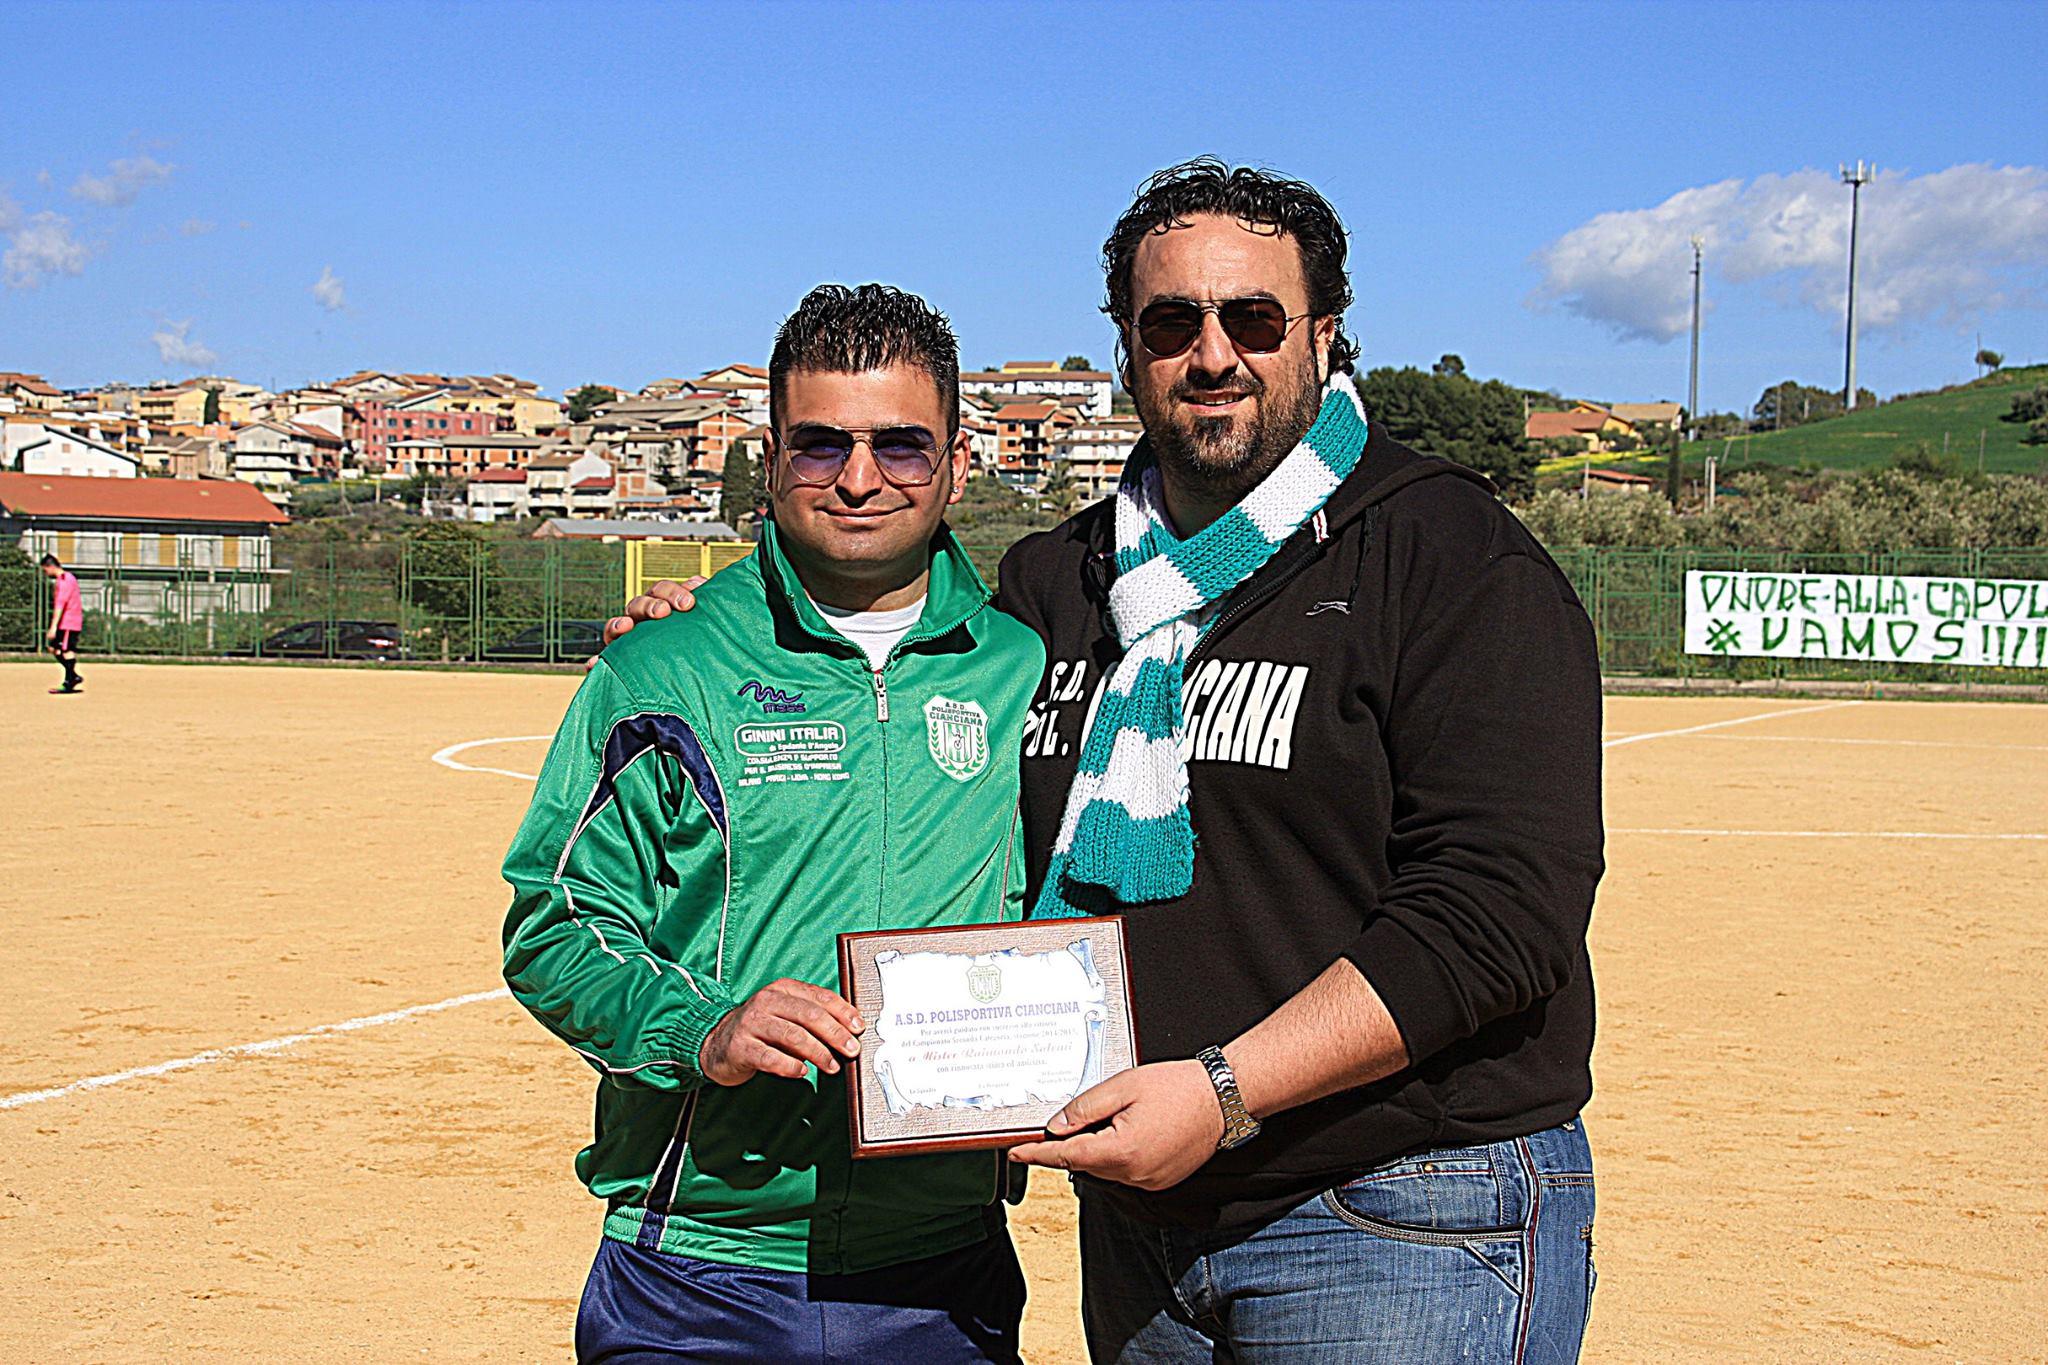 Festa Polisportiva Cianciana 2015 (4)